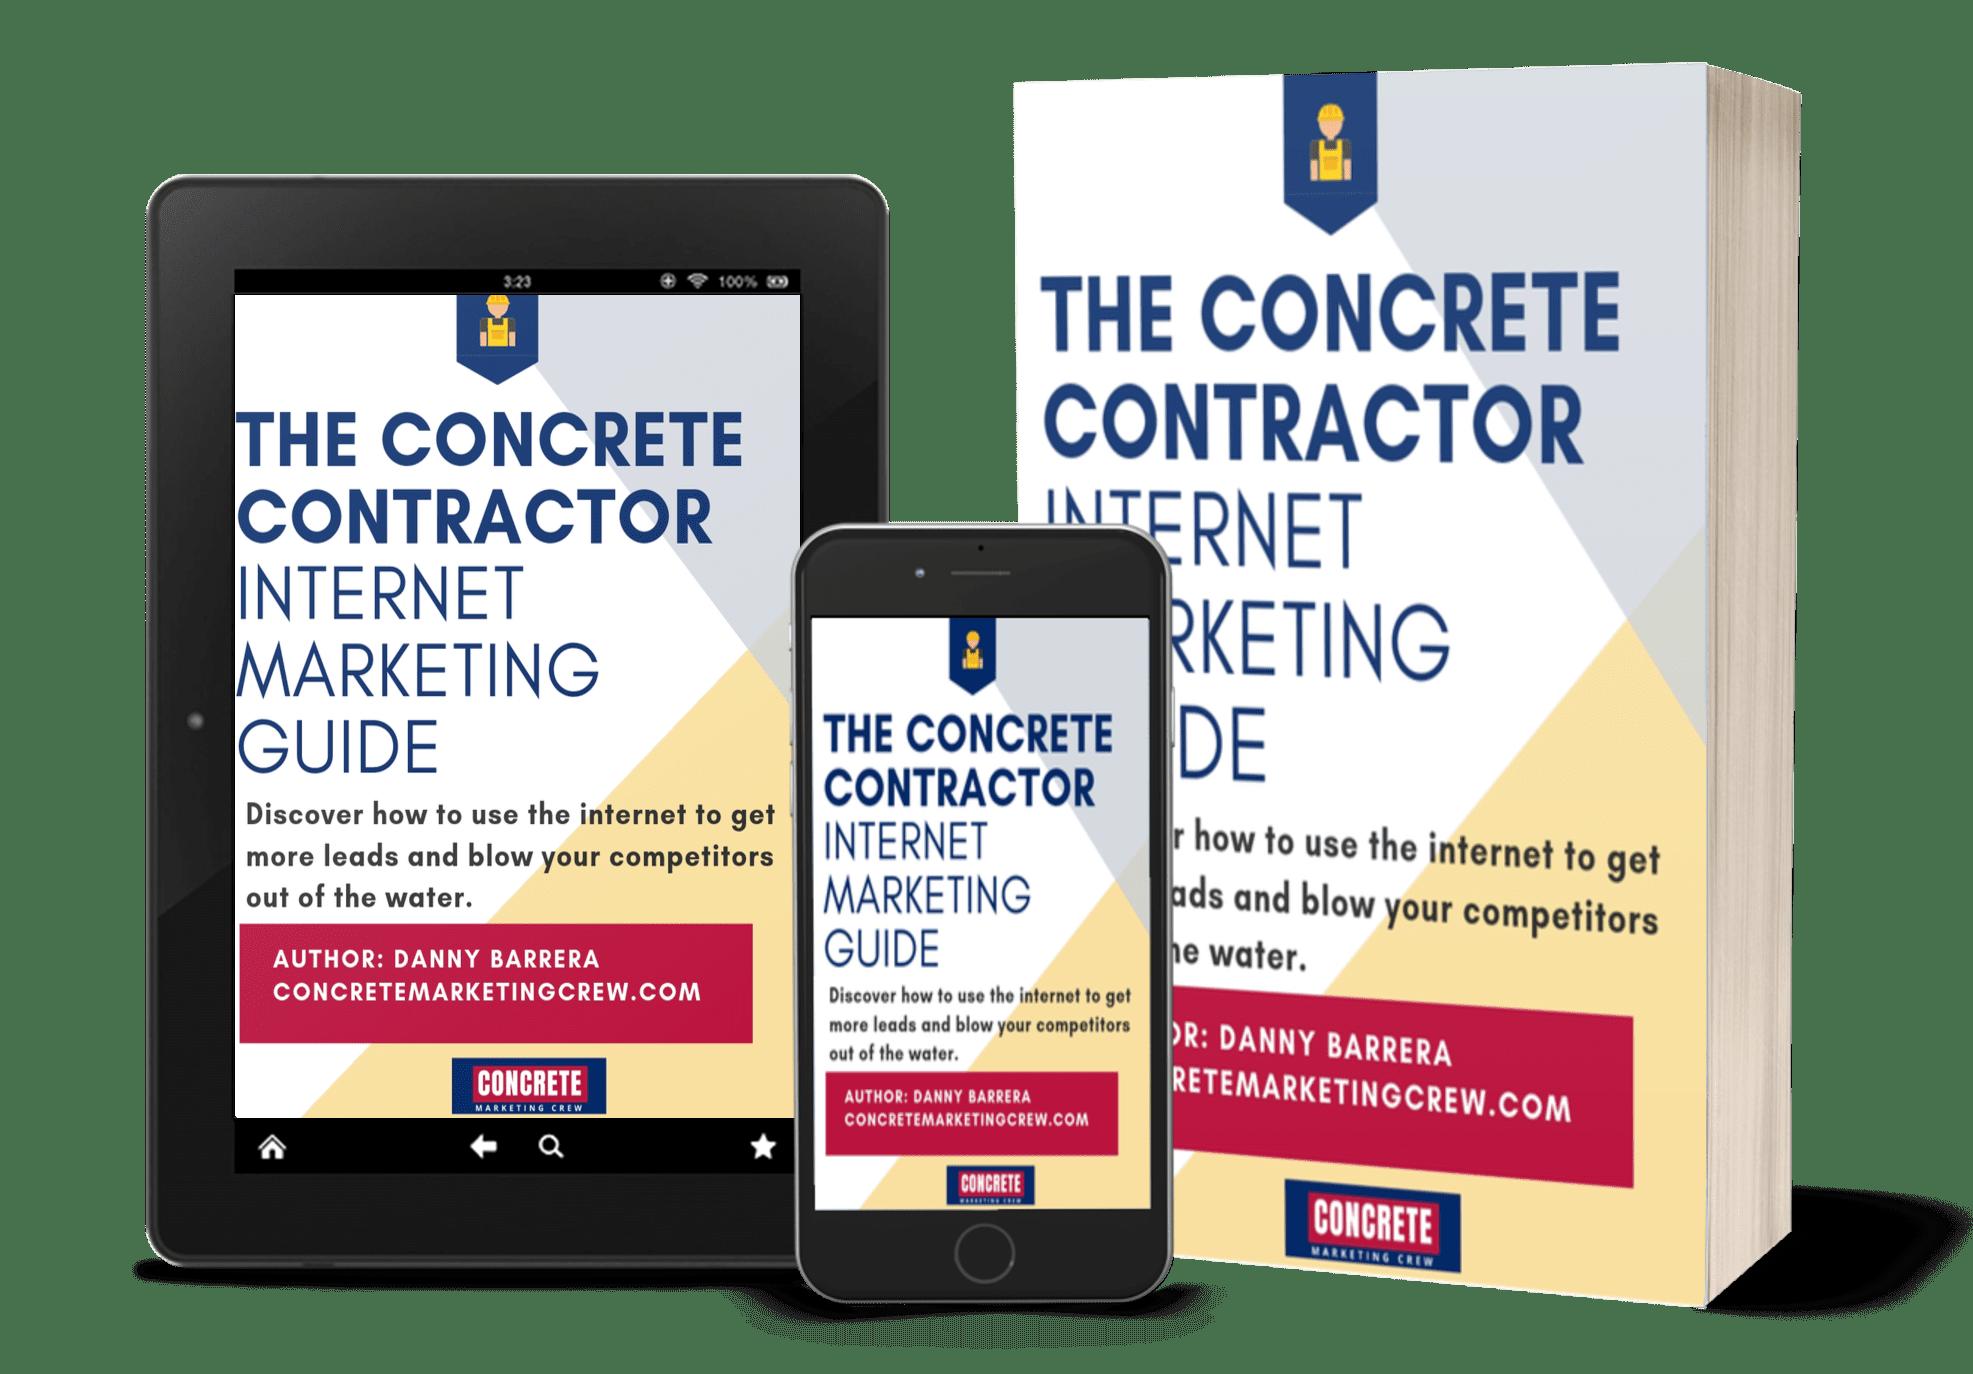 Official-Concrete-Contractor-Internet-Marketing_Guide